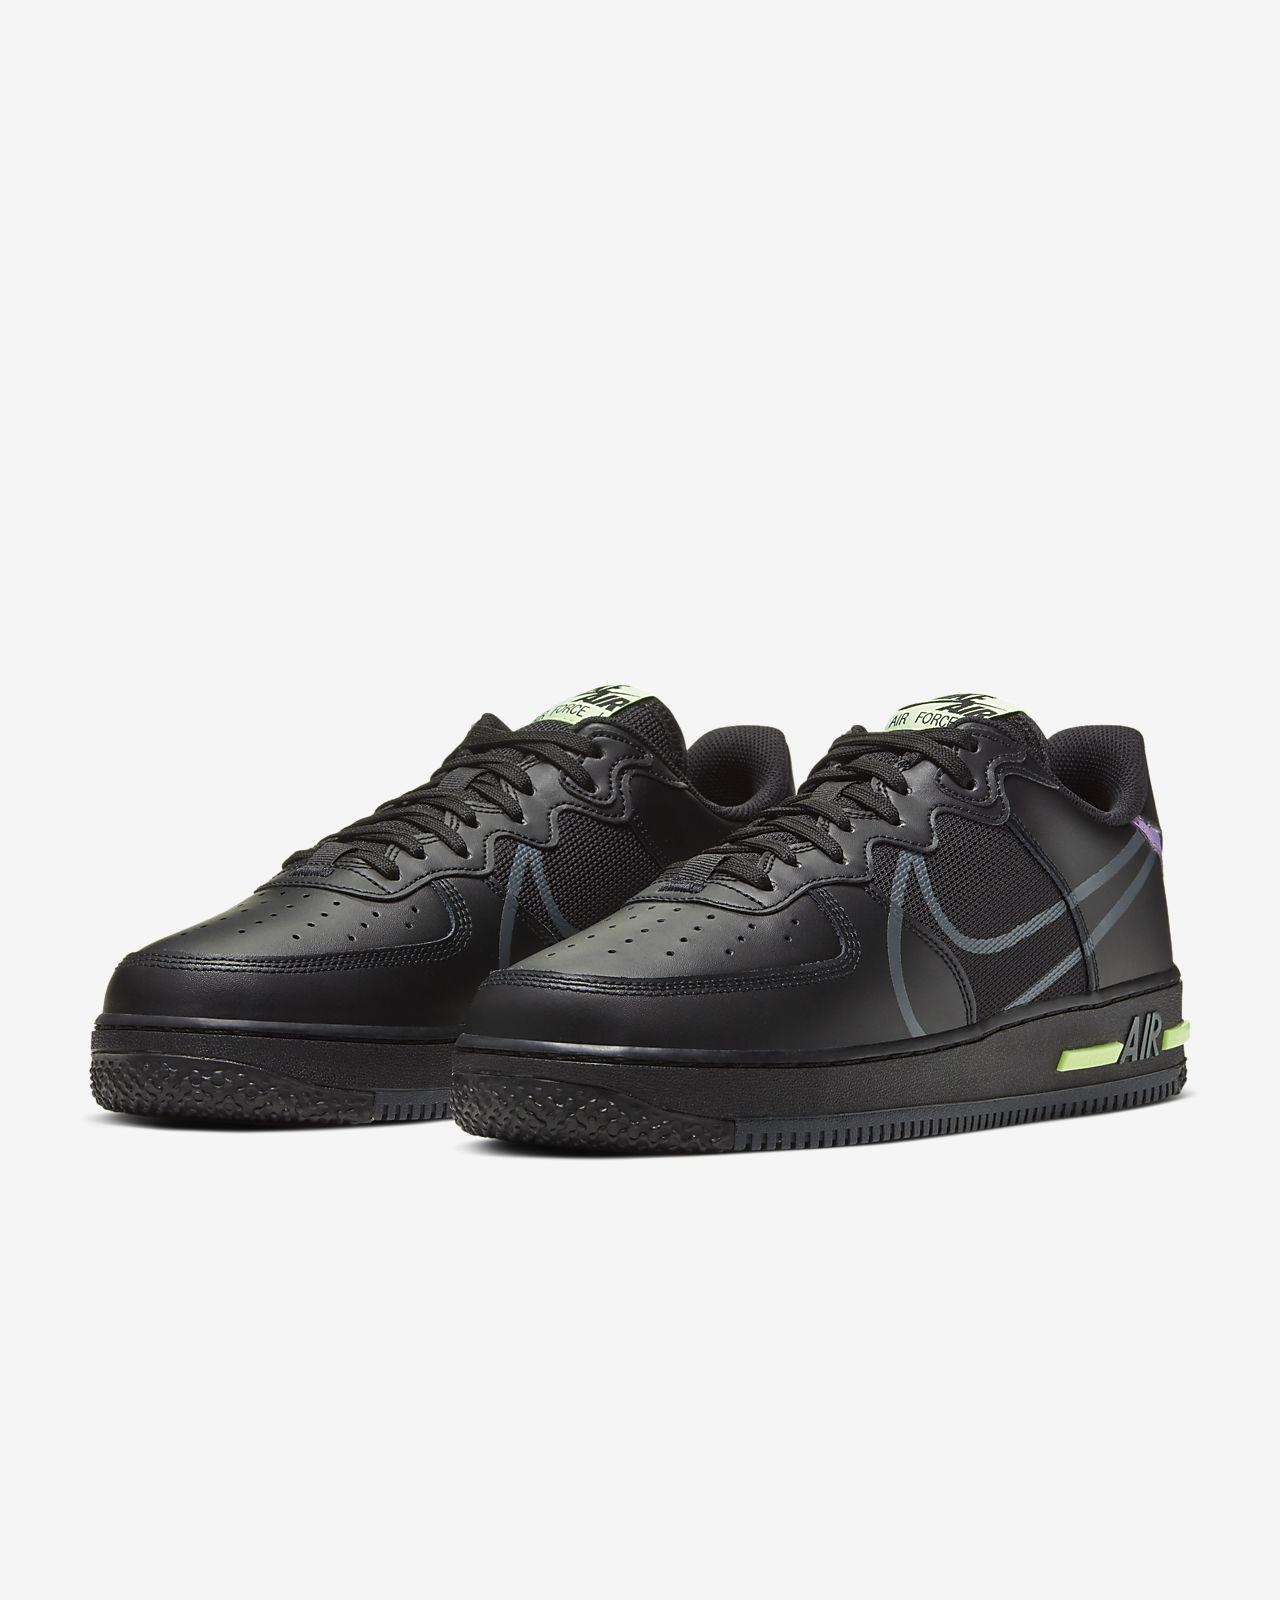 Nike Air Force 1 Off White Black